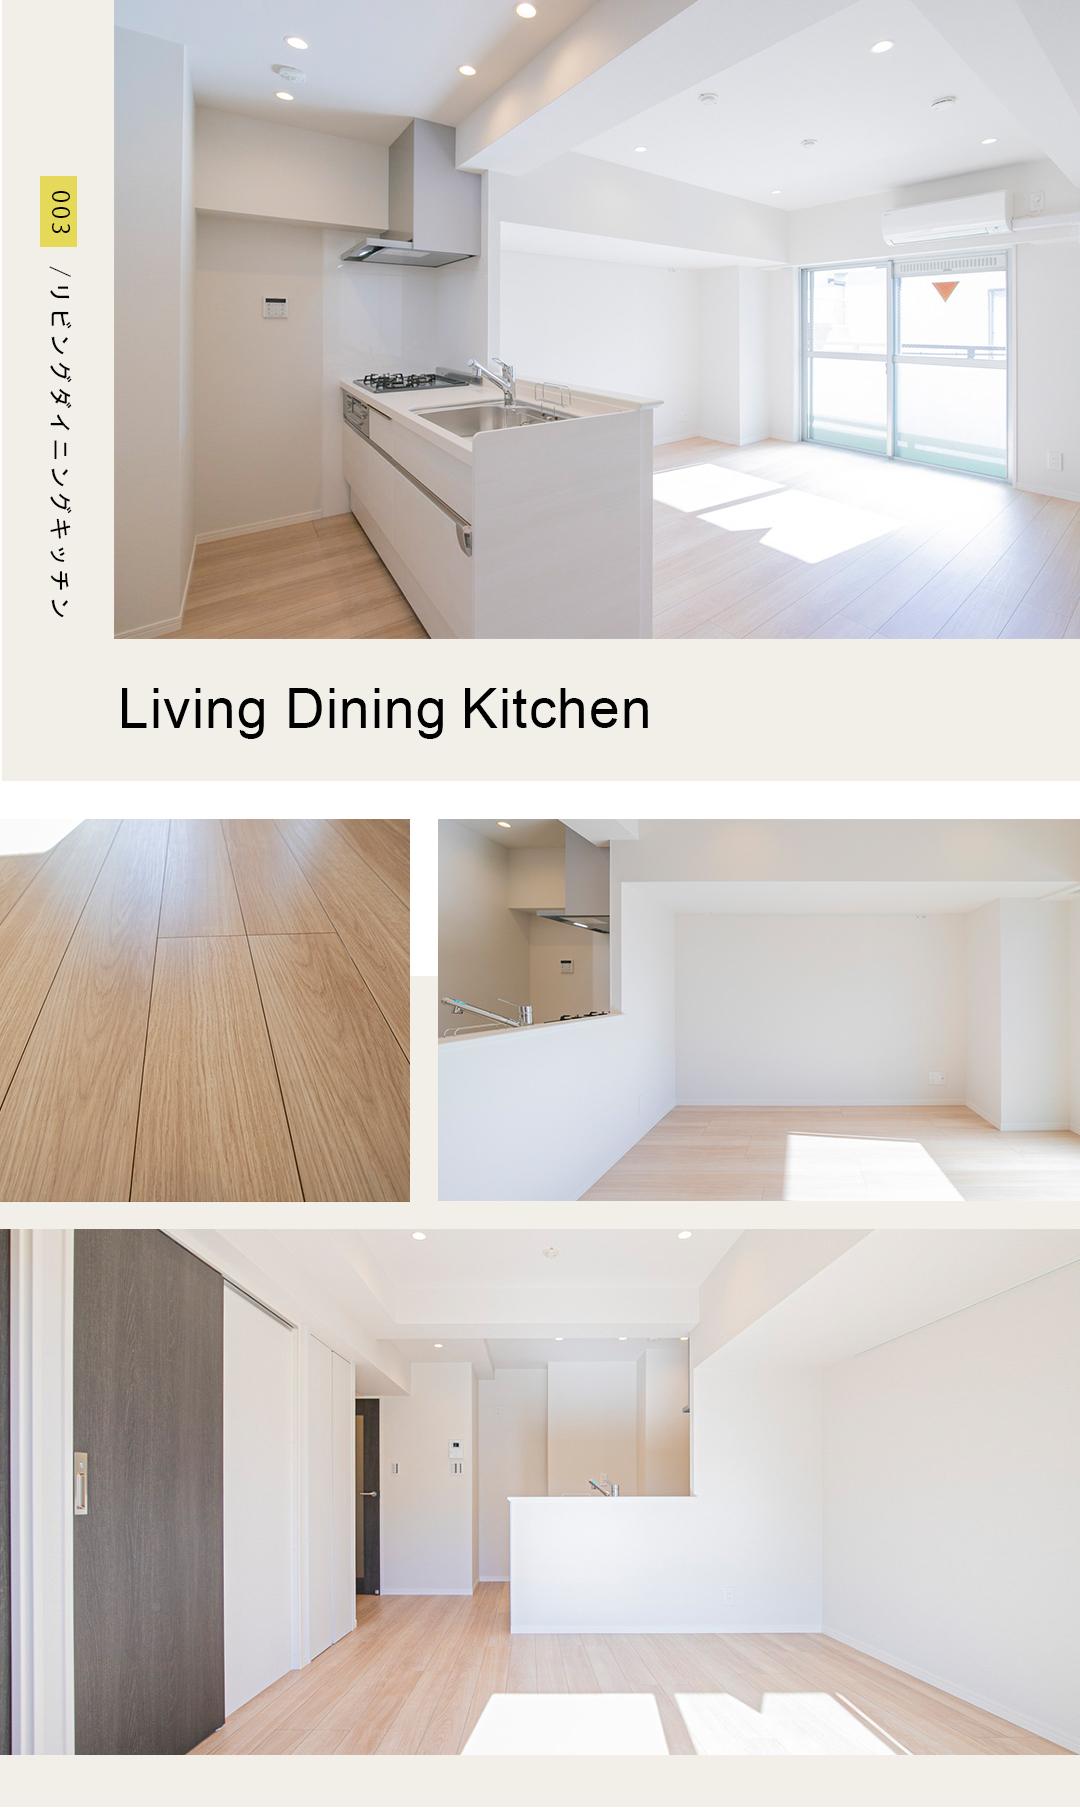 003,LivingDiningKitchen,リビングダイニングキッチン,,,,,,